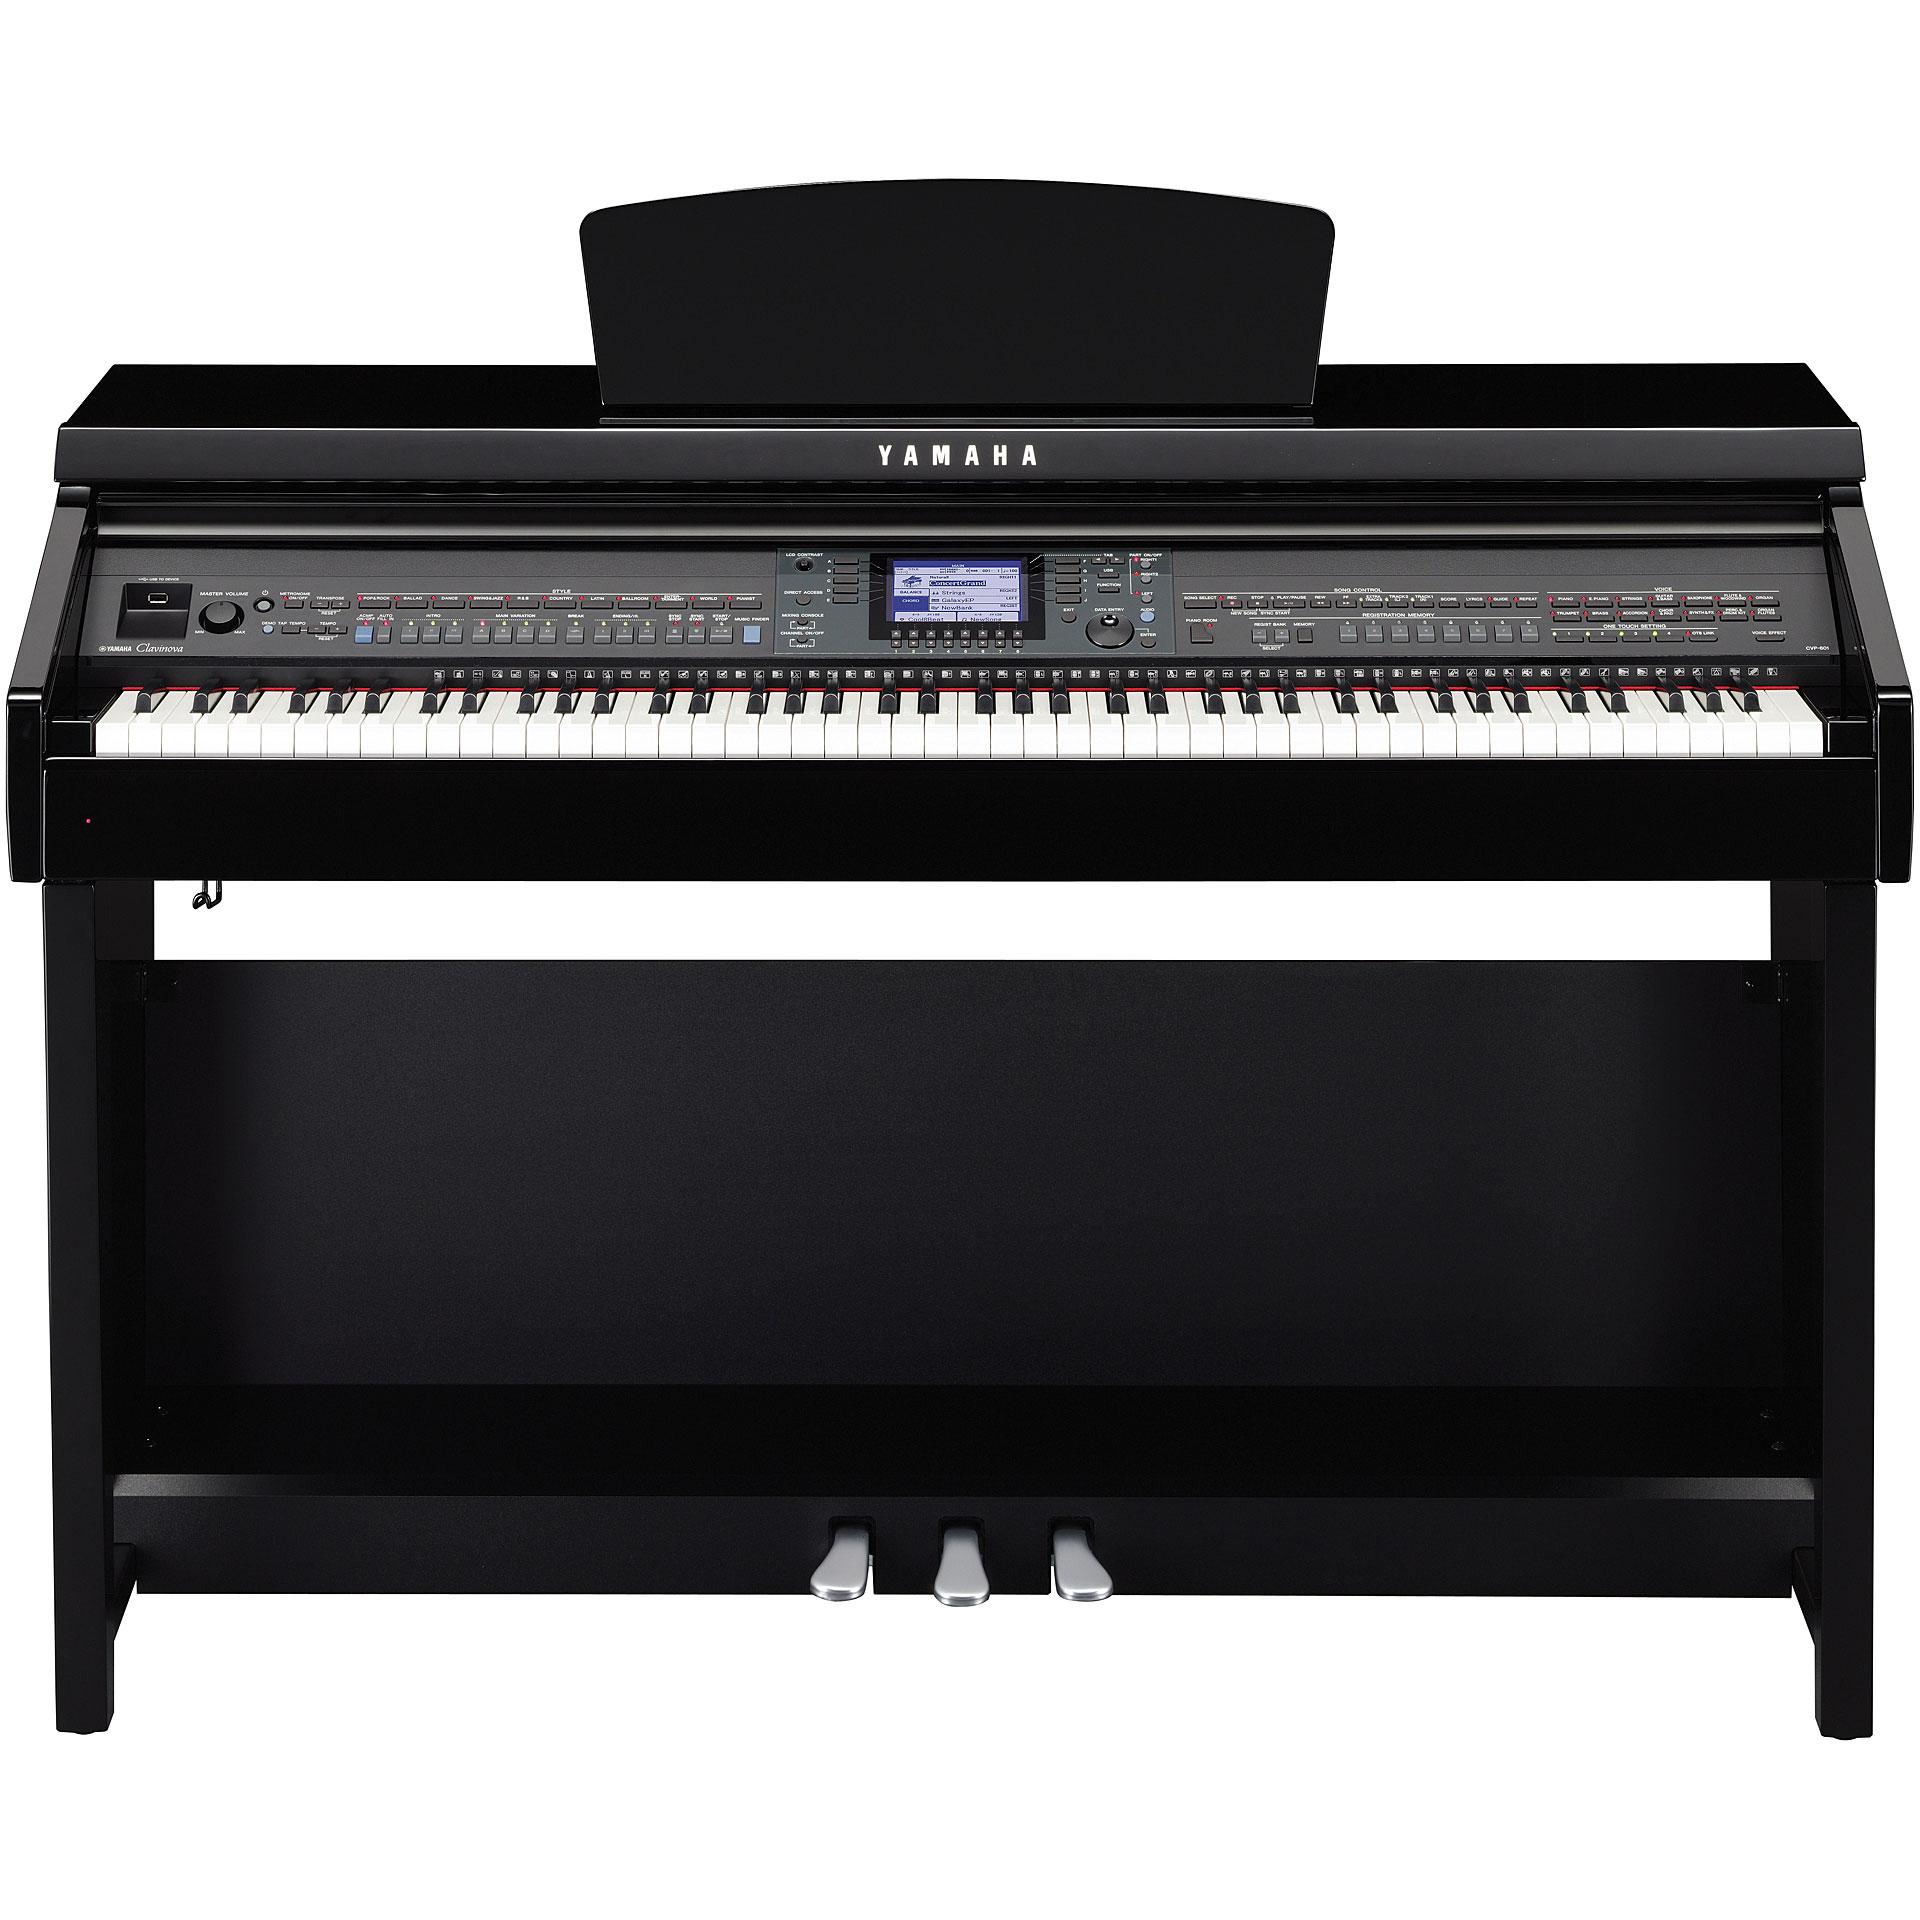 Yamaha clavinova cvp 601 pe digital piano for Yamaha clavinova cvp 601